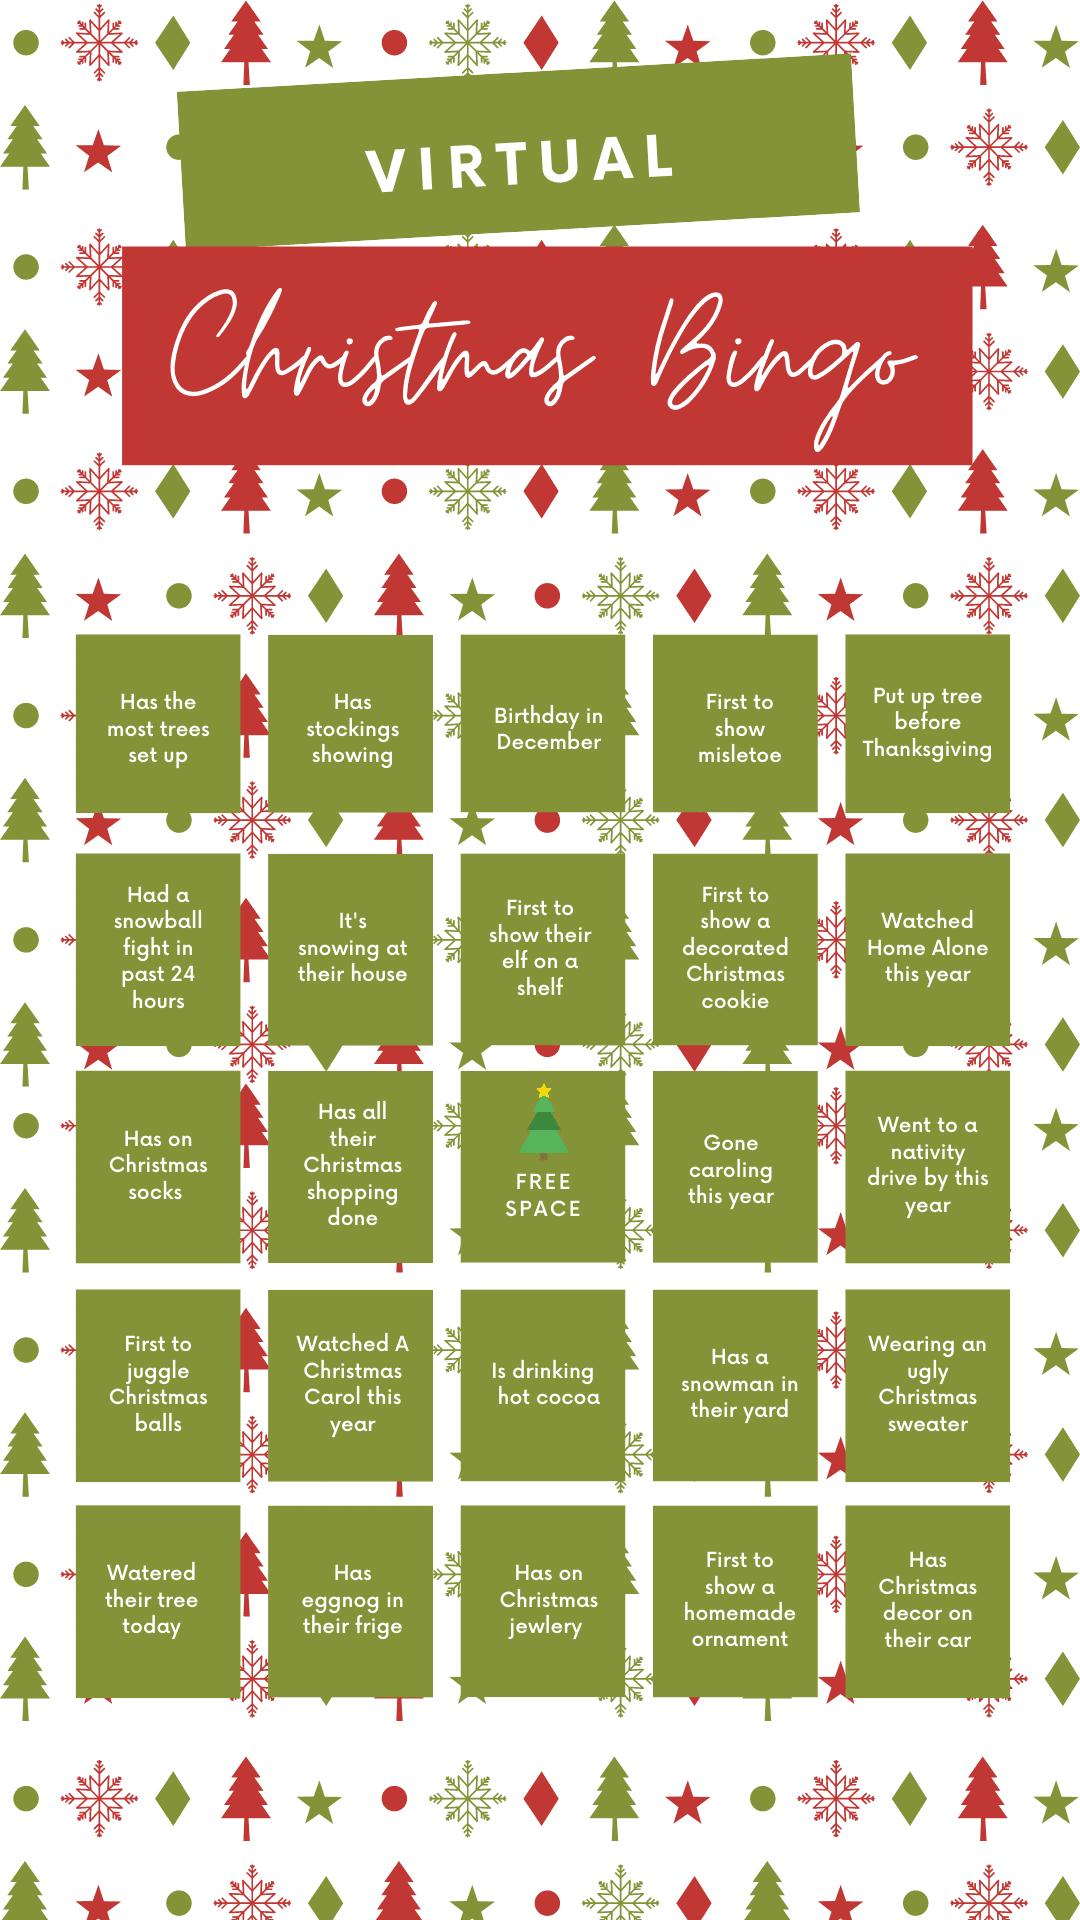 virtual christmas party bingo game